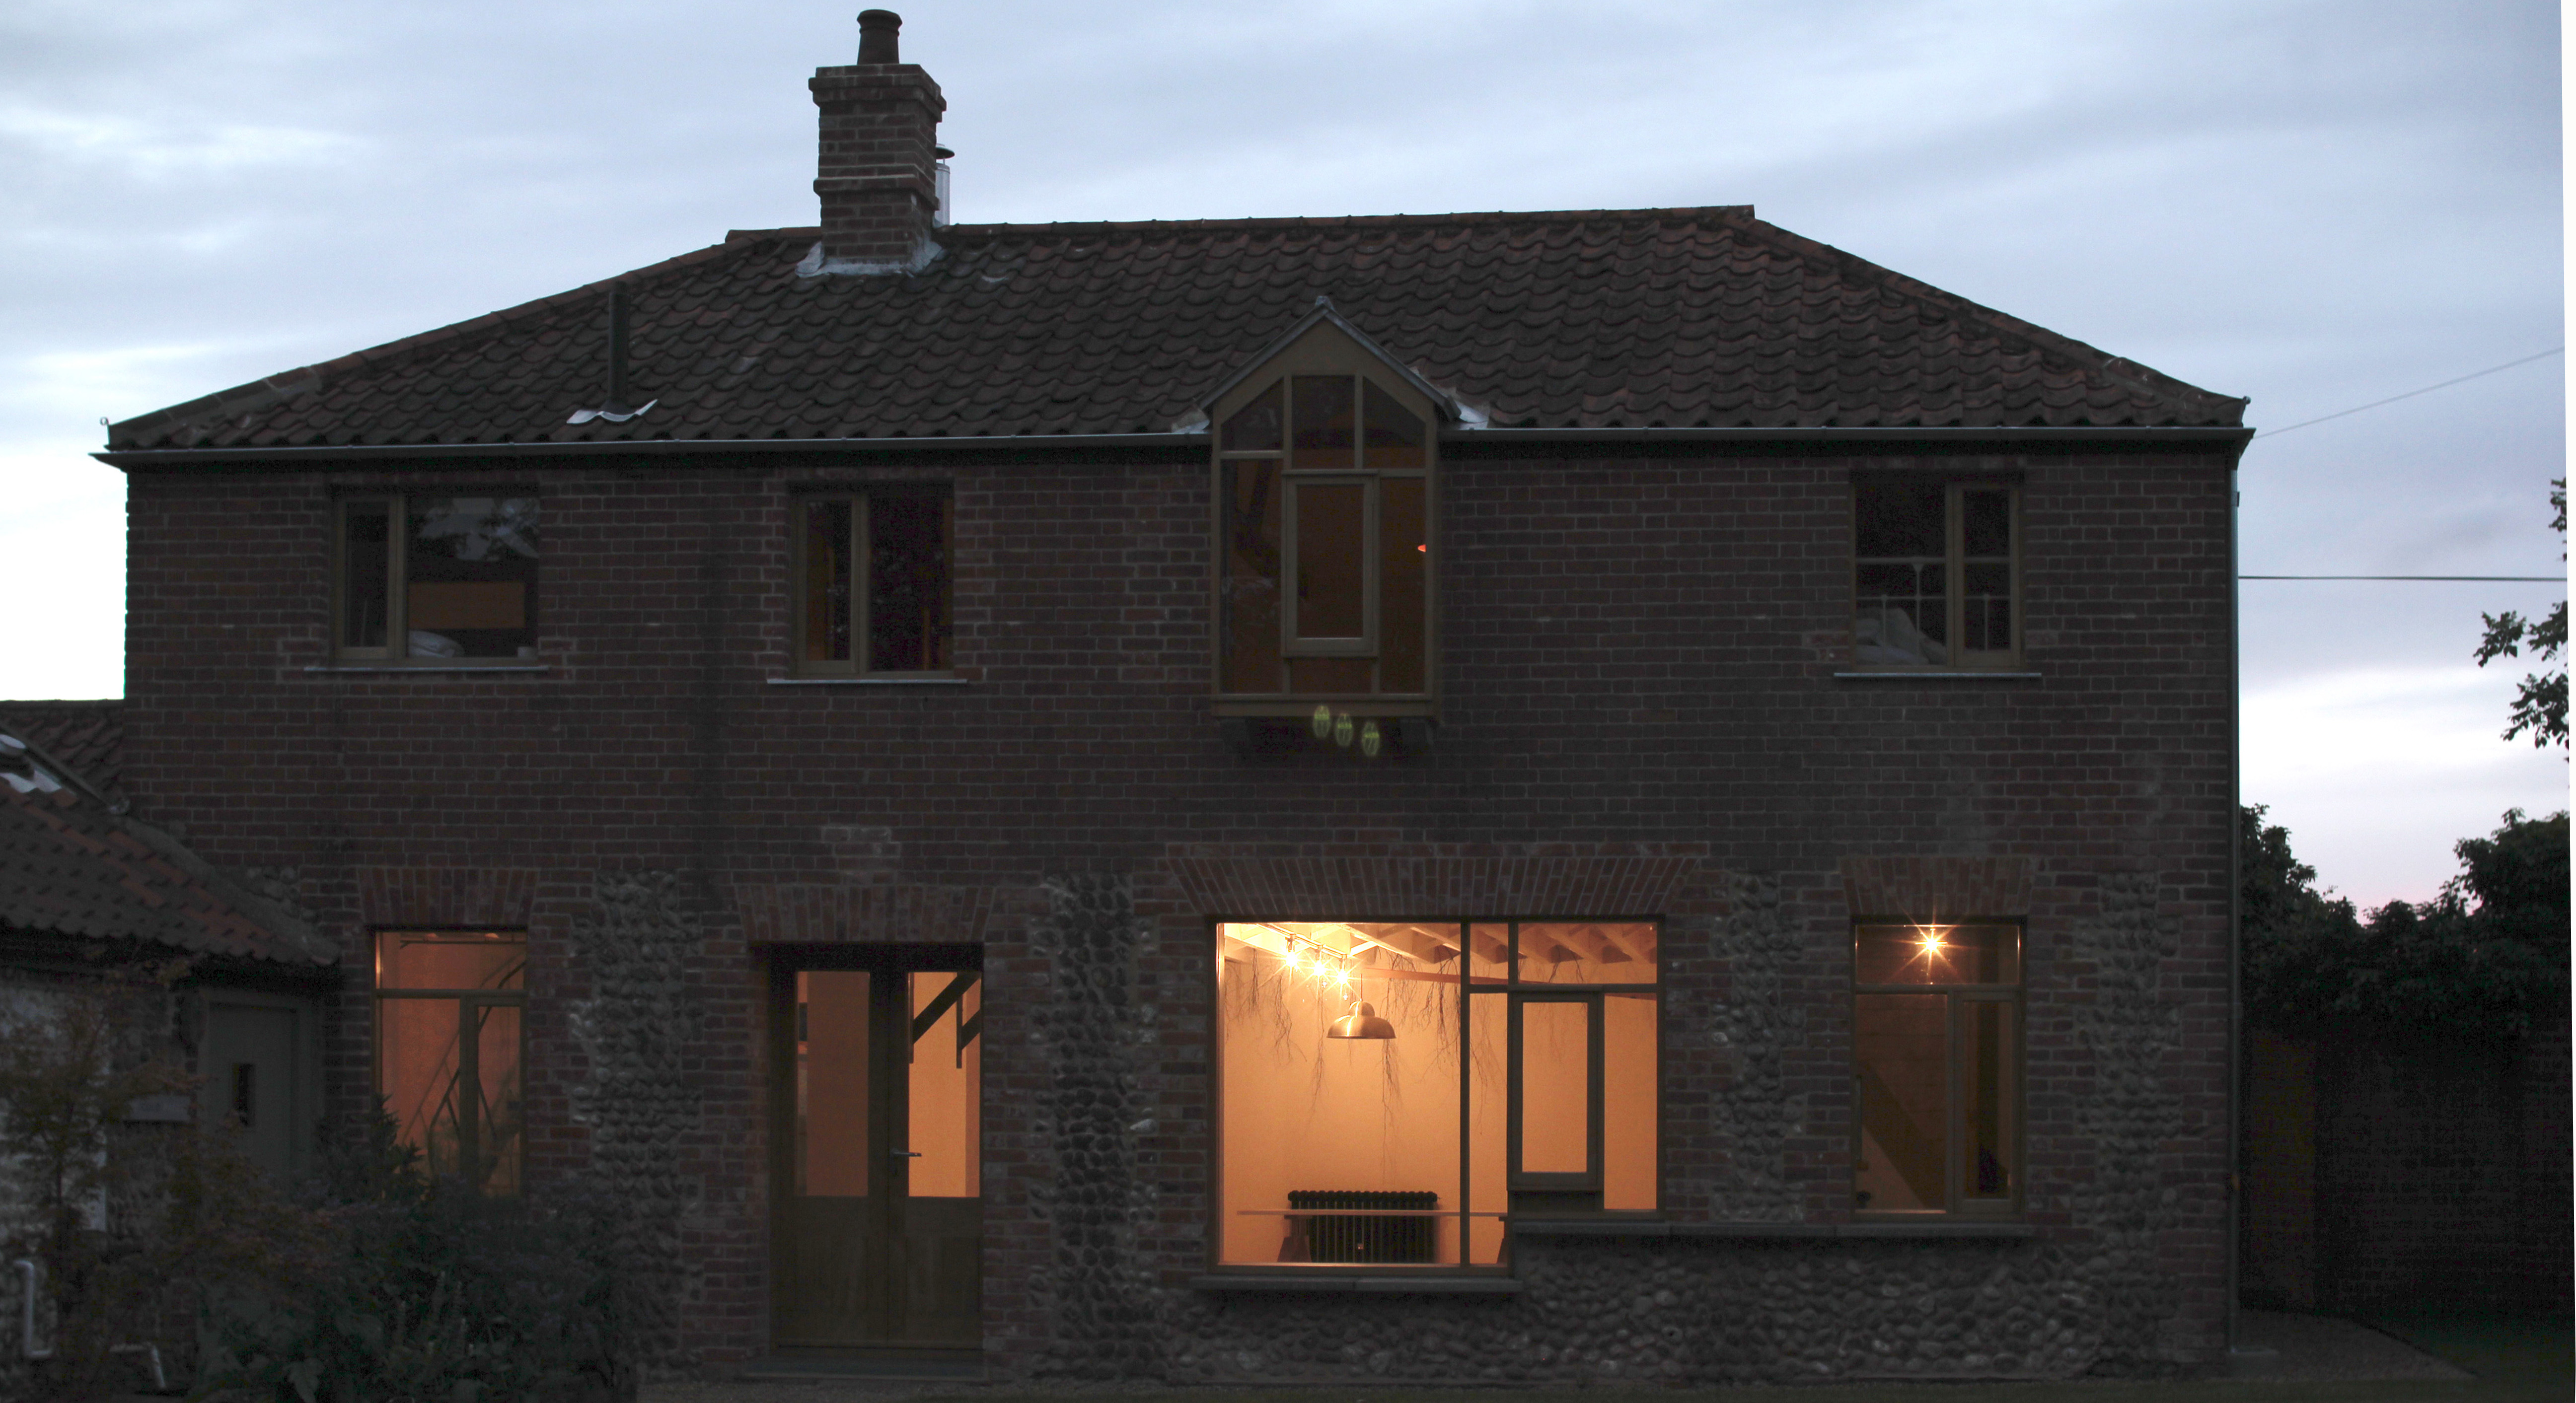 20.facade at night